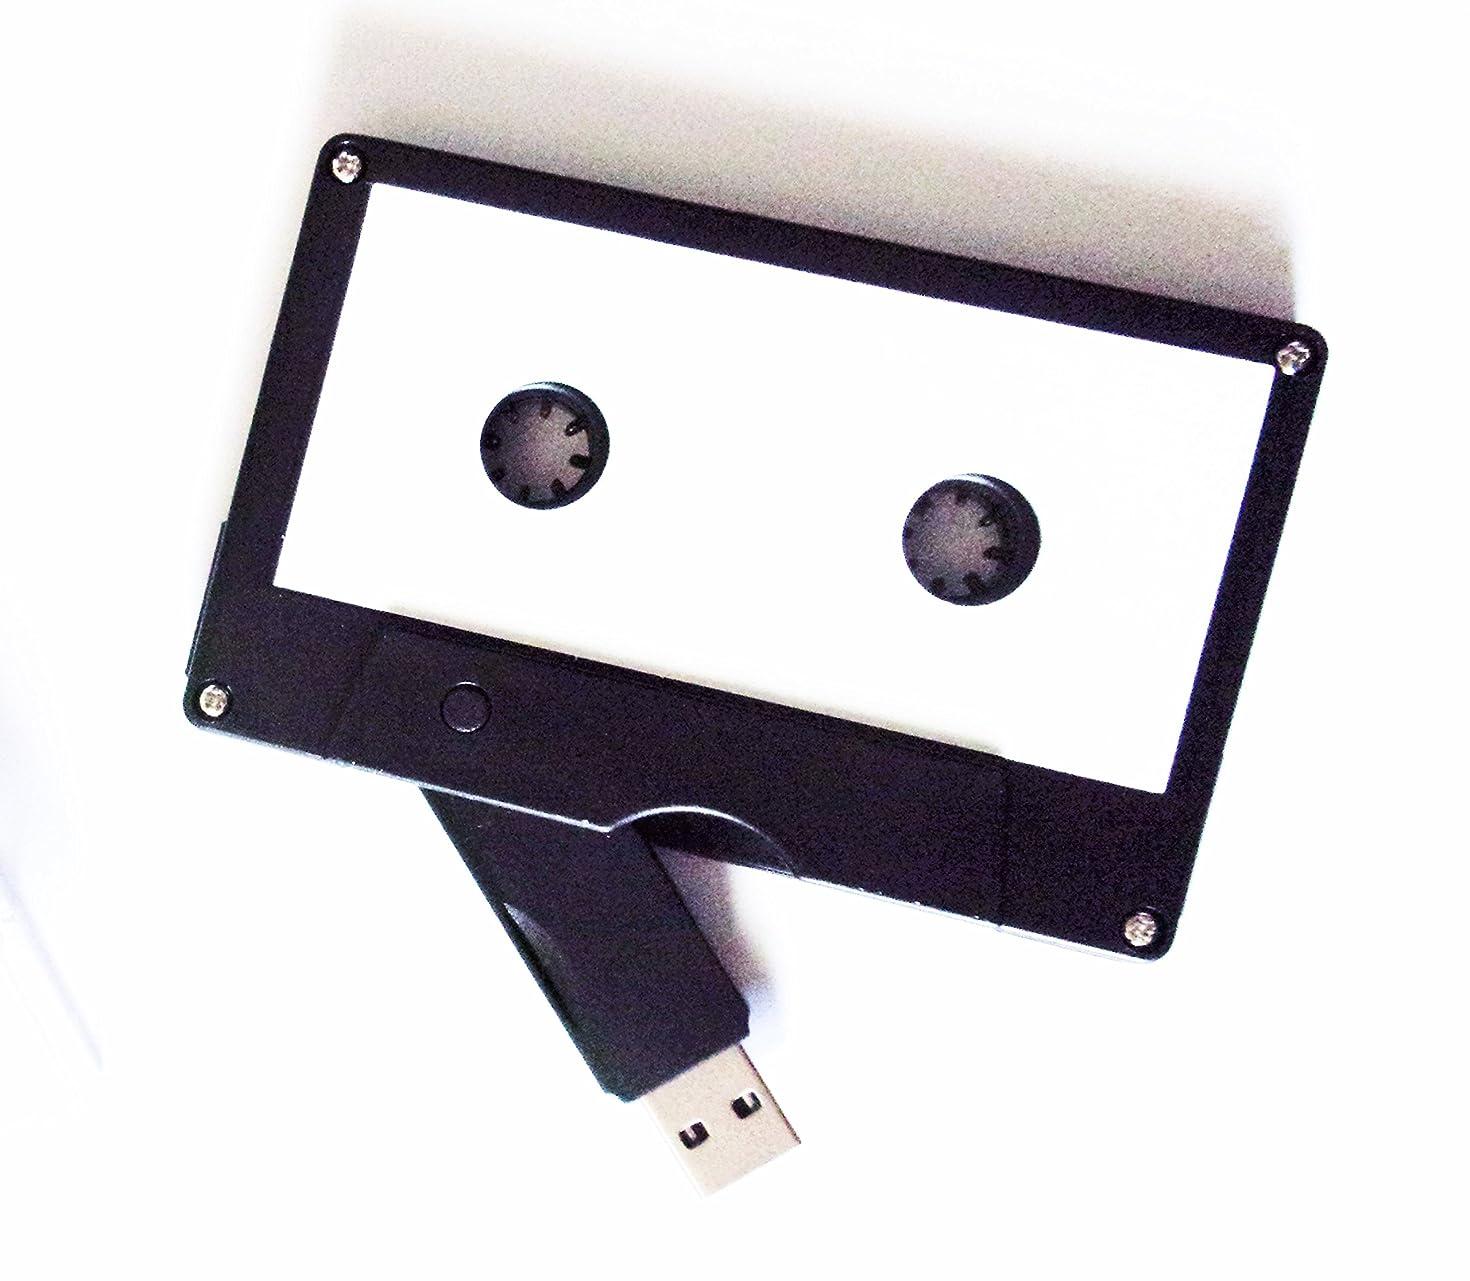 Cassette Tape USB Stick Flash Drive, 8 GB, 2.0 USB- DIY Design, Data Storage, Flash Drive, Jump Drive, Computer Data, Music Storage, Picture Storage, Custom Gift